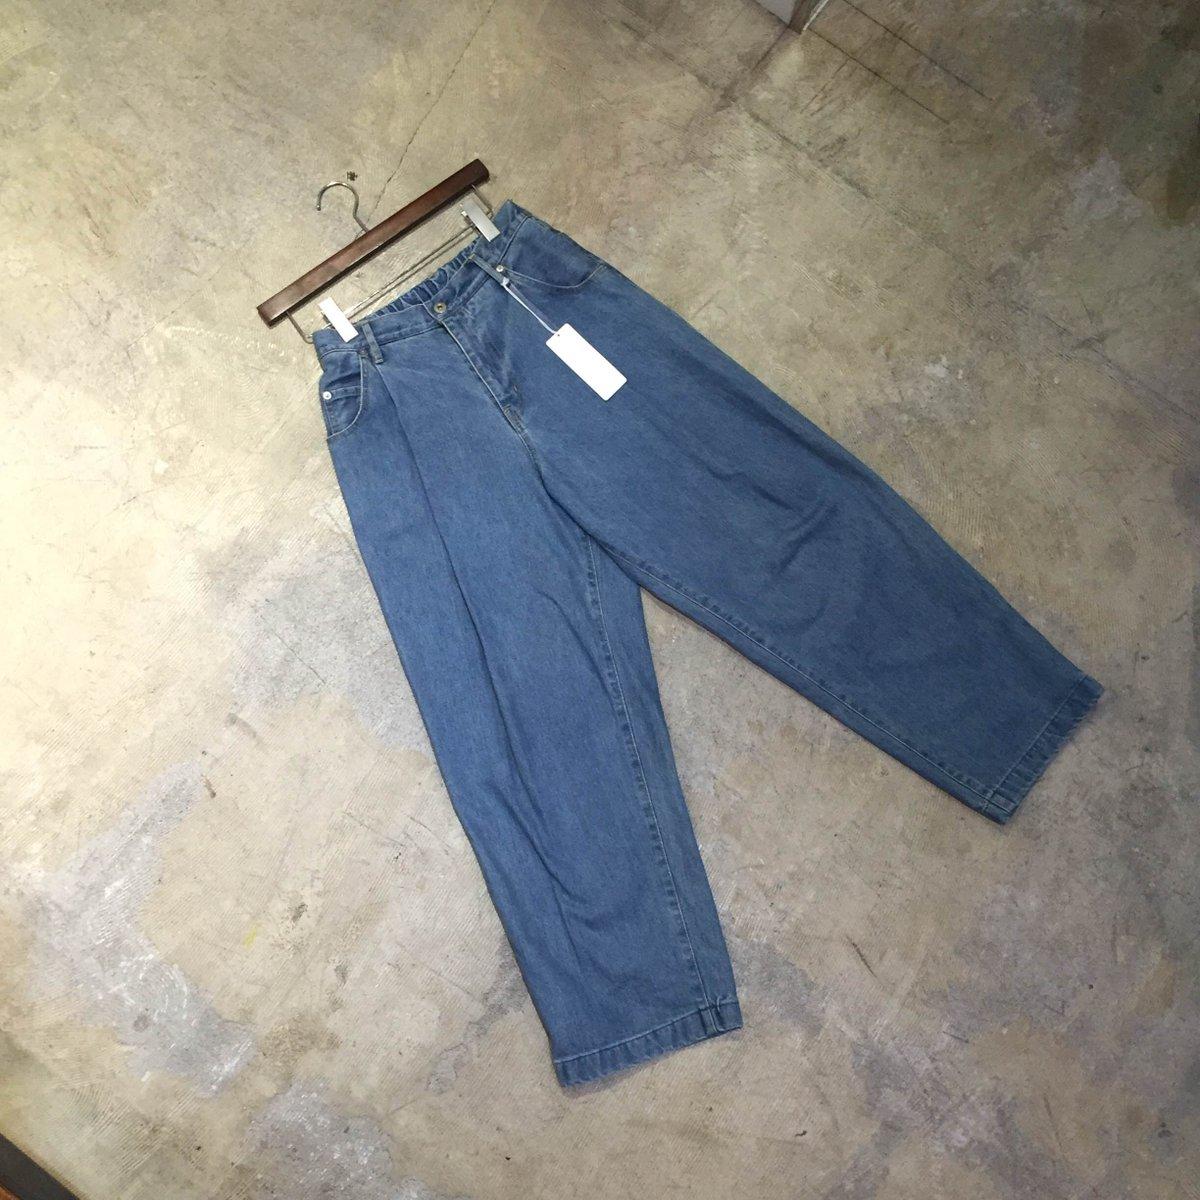 NEON SIGN WIDE DENIM SLACKS PANTS